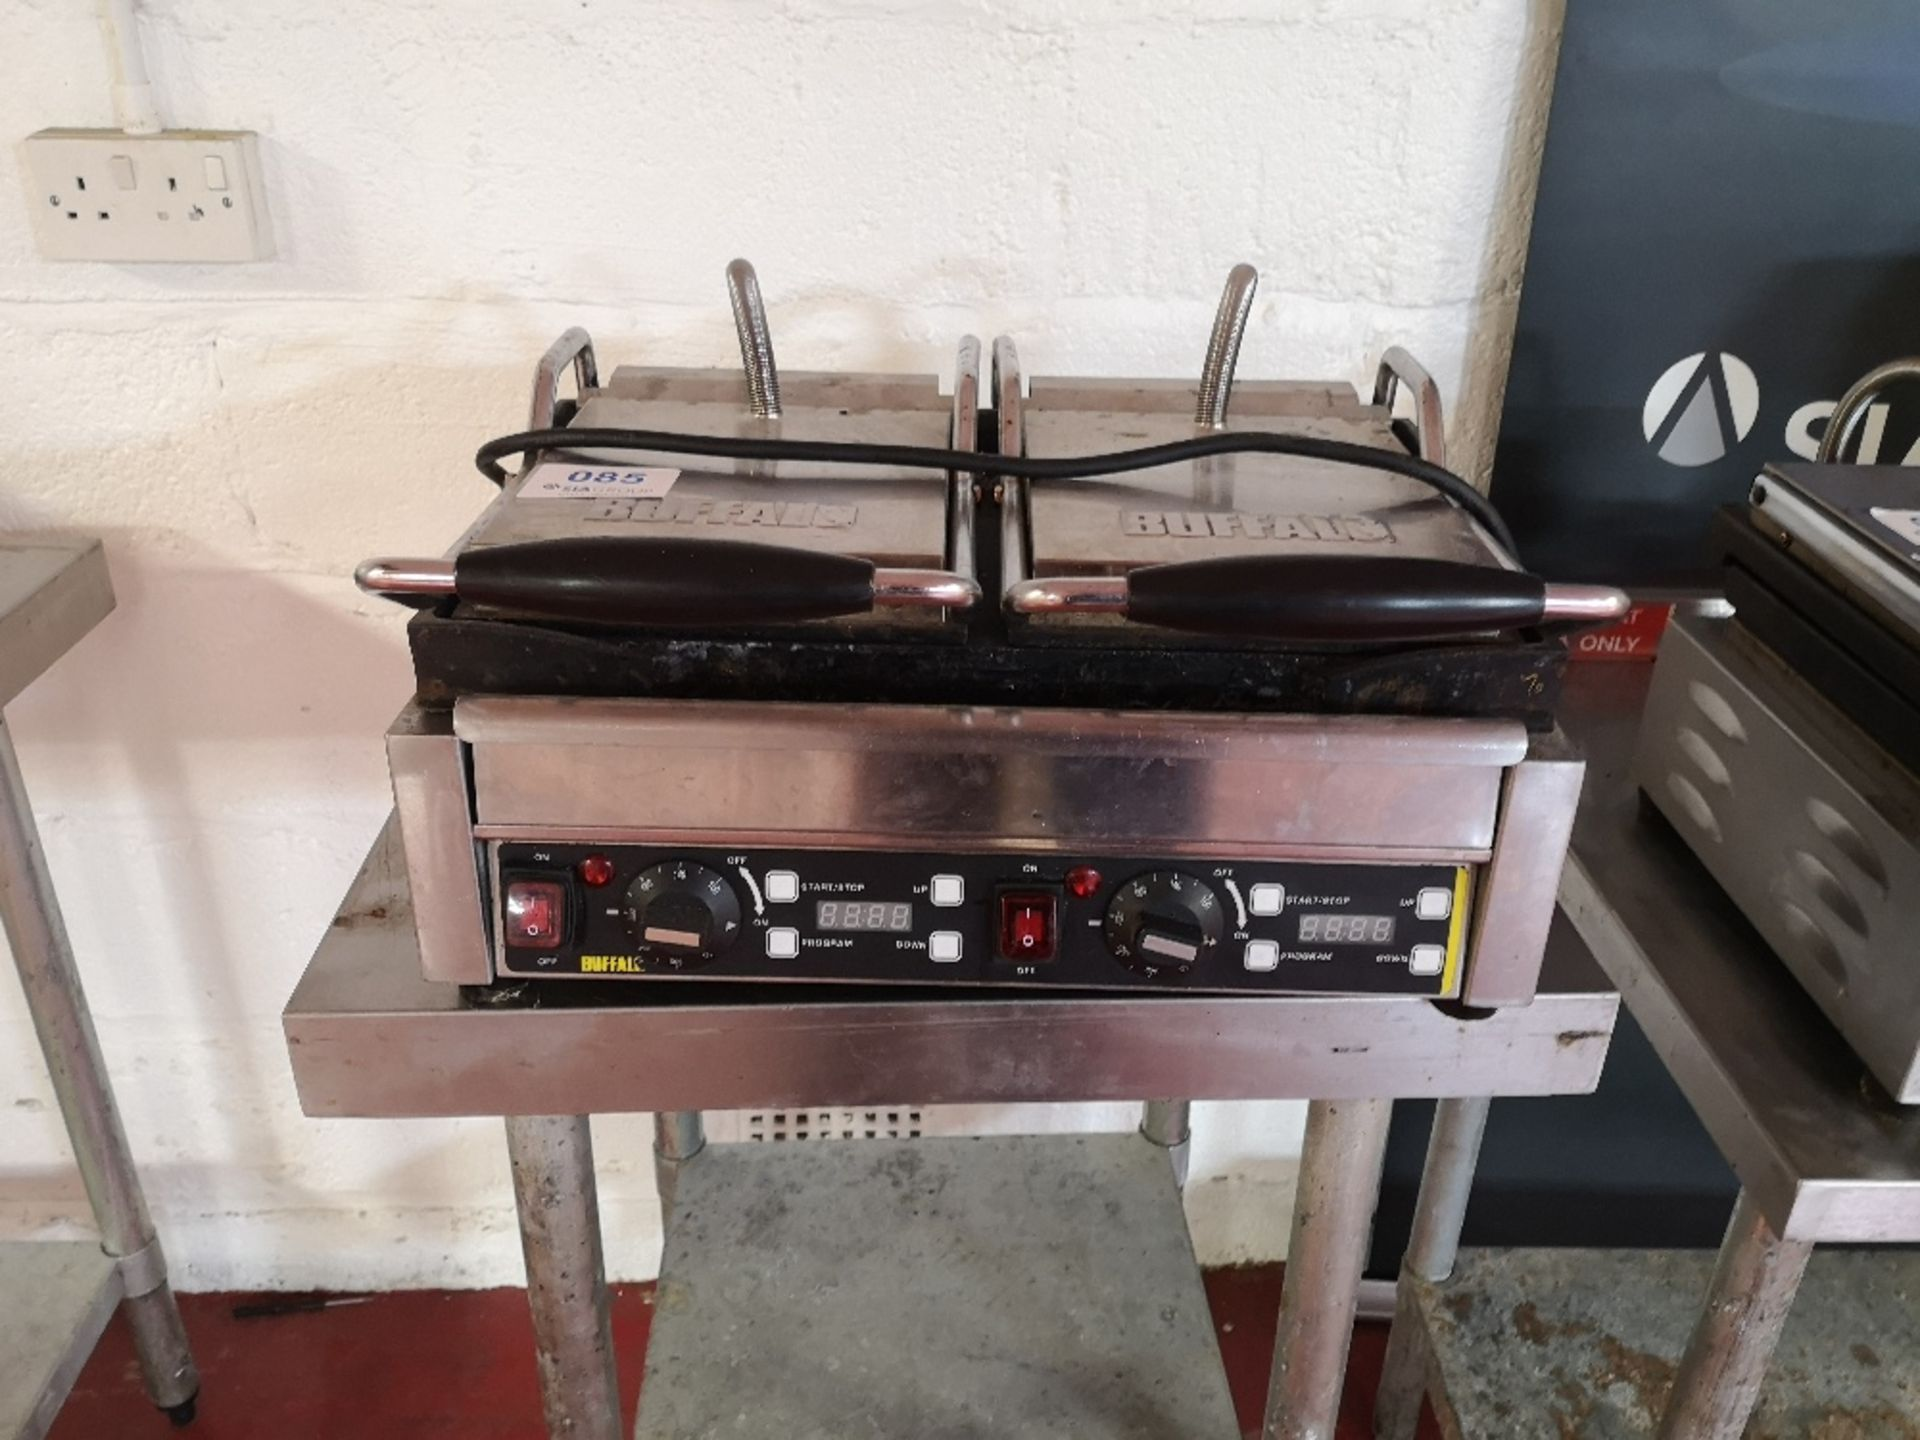 Buffalo L553-B-03 Double Contact Grill